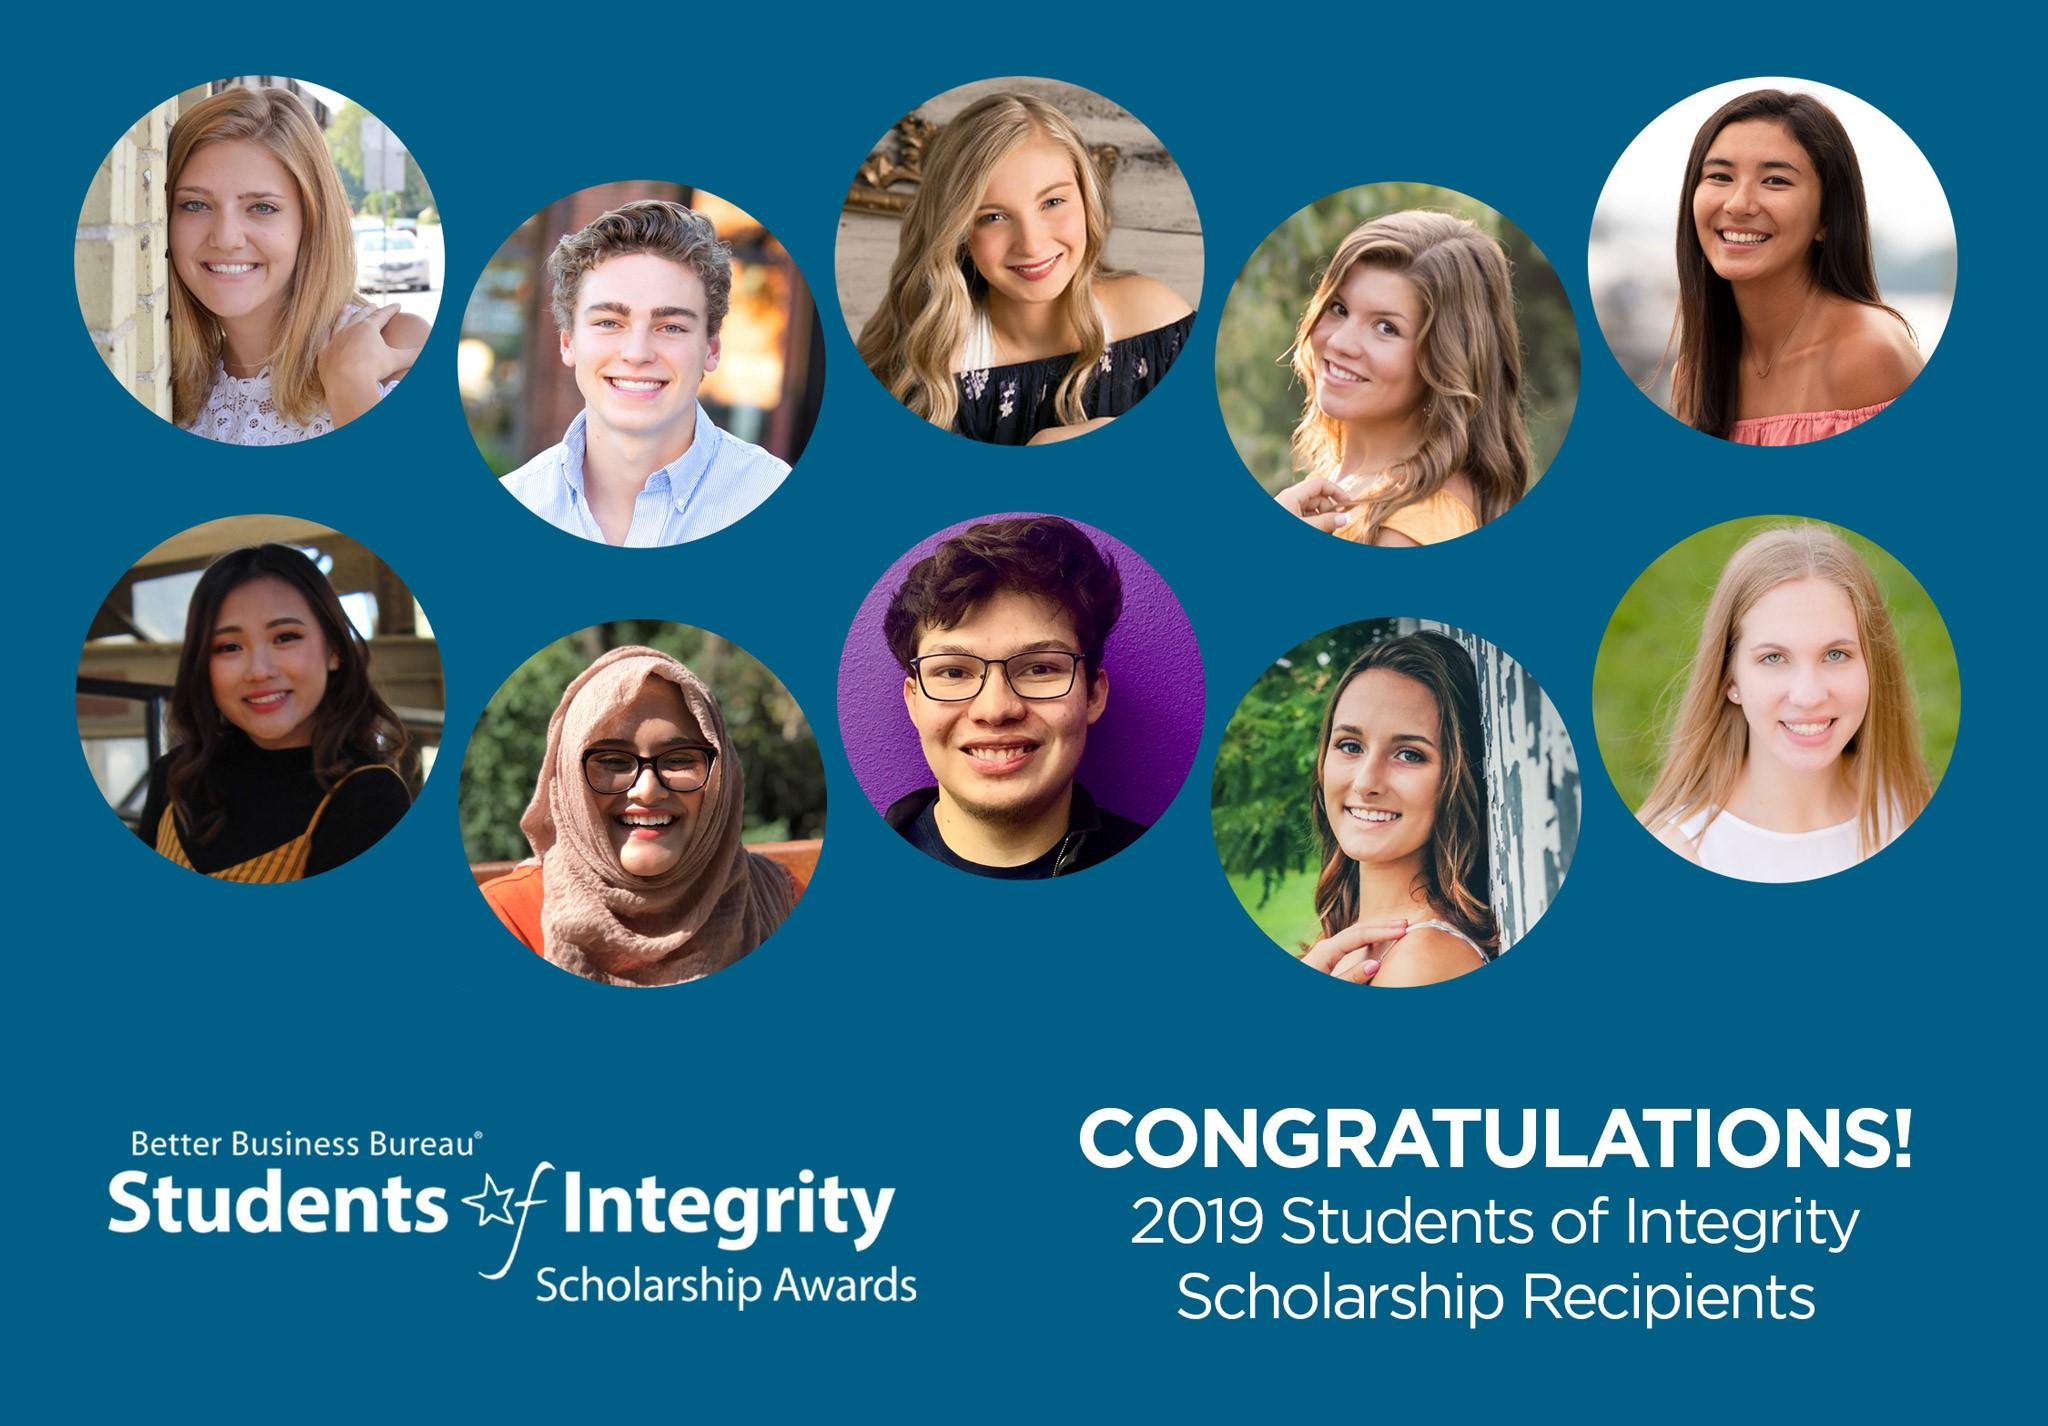 BBB Serving Wisconsin Awards $25,000 in Scholarships to Wisconsin High School Seniors